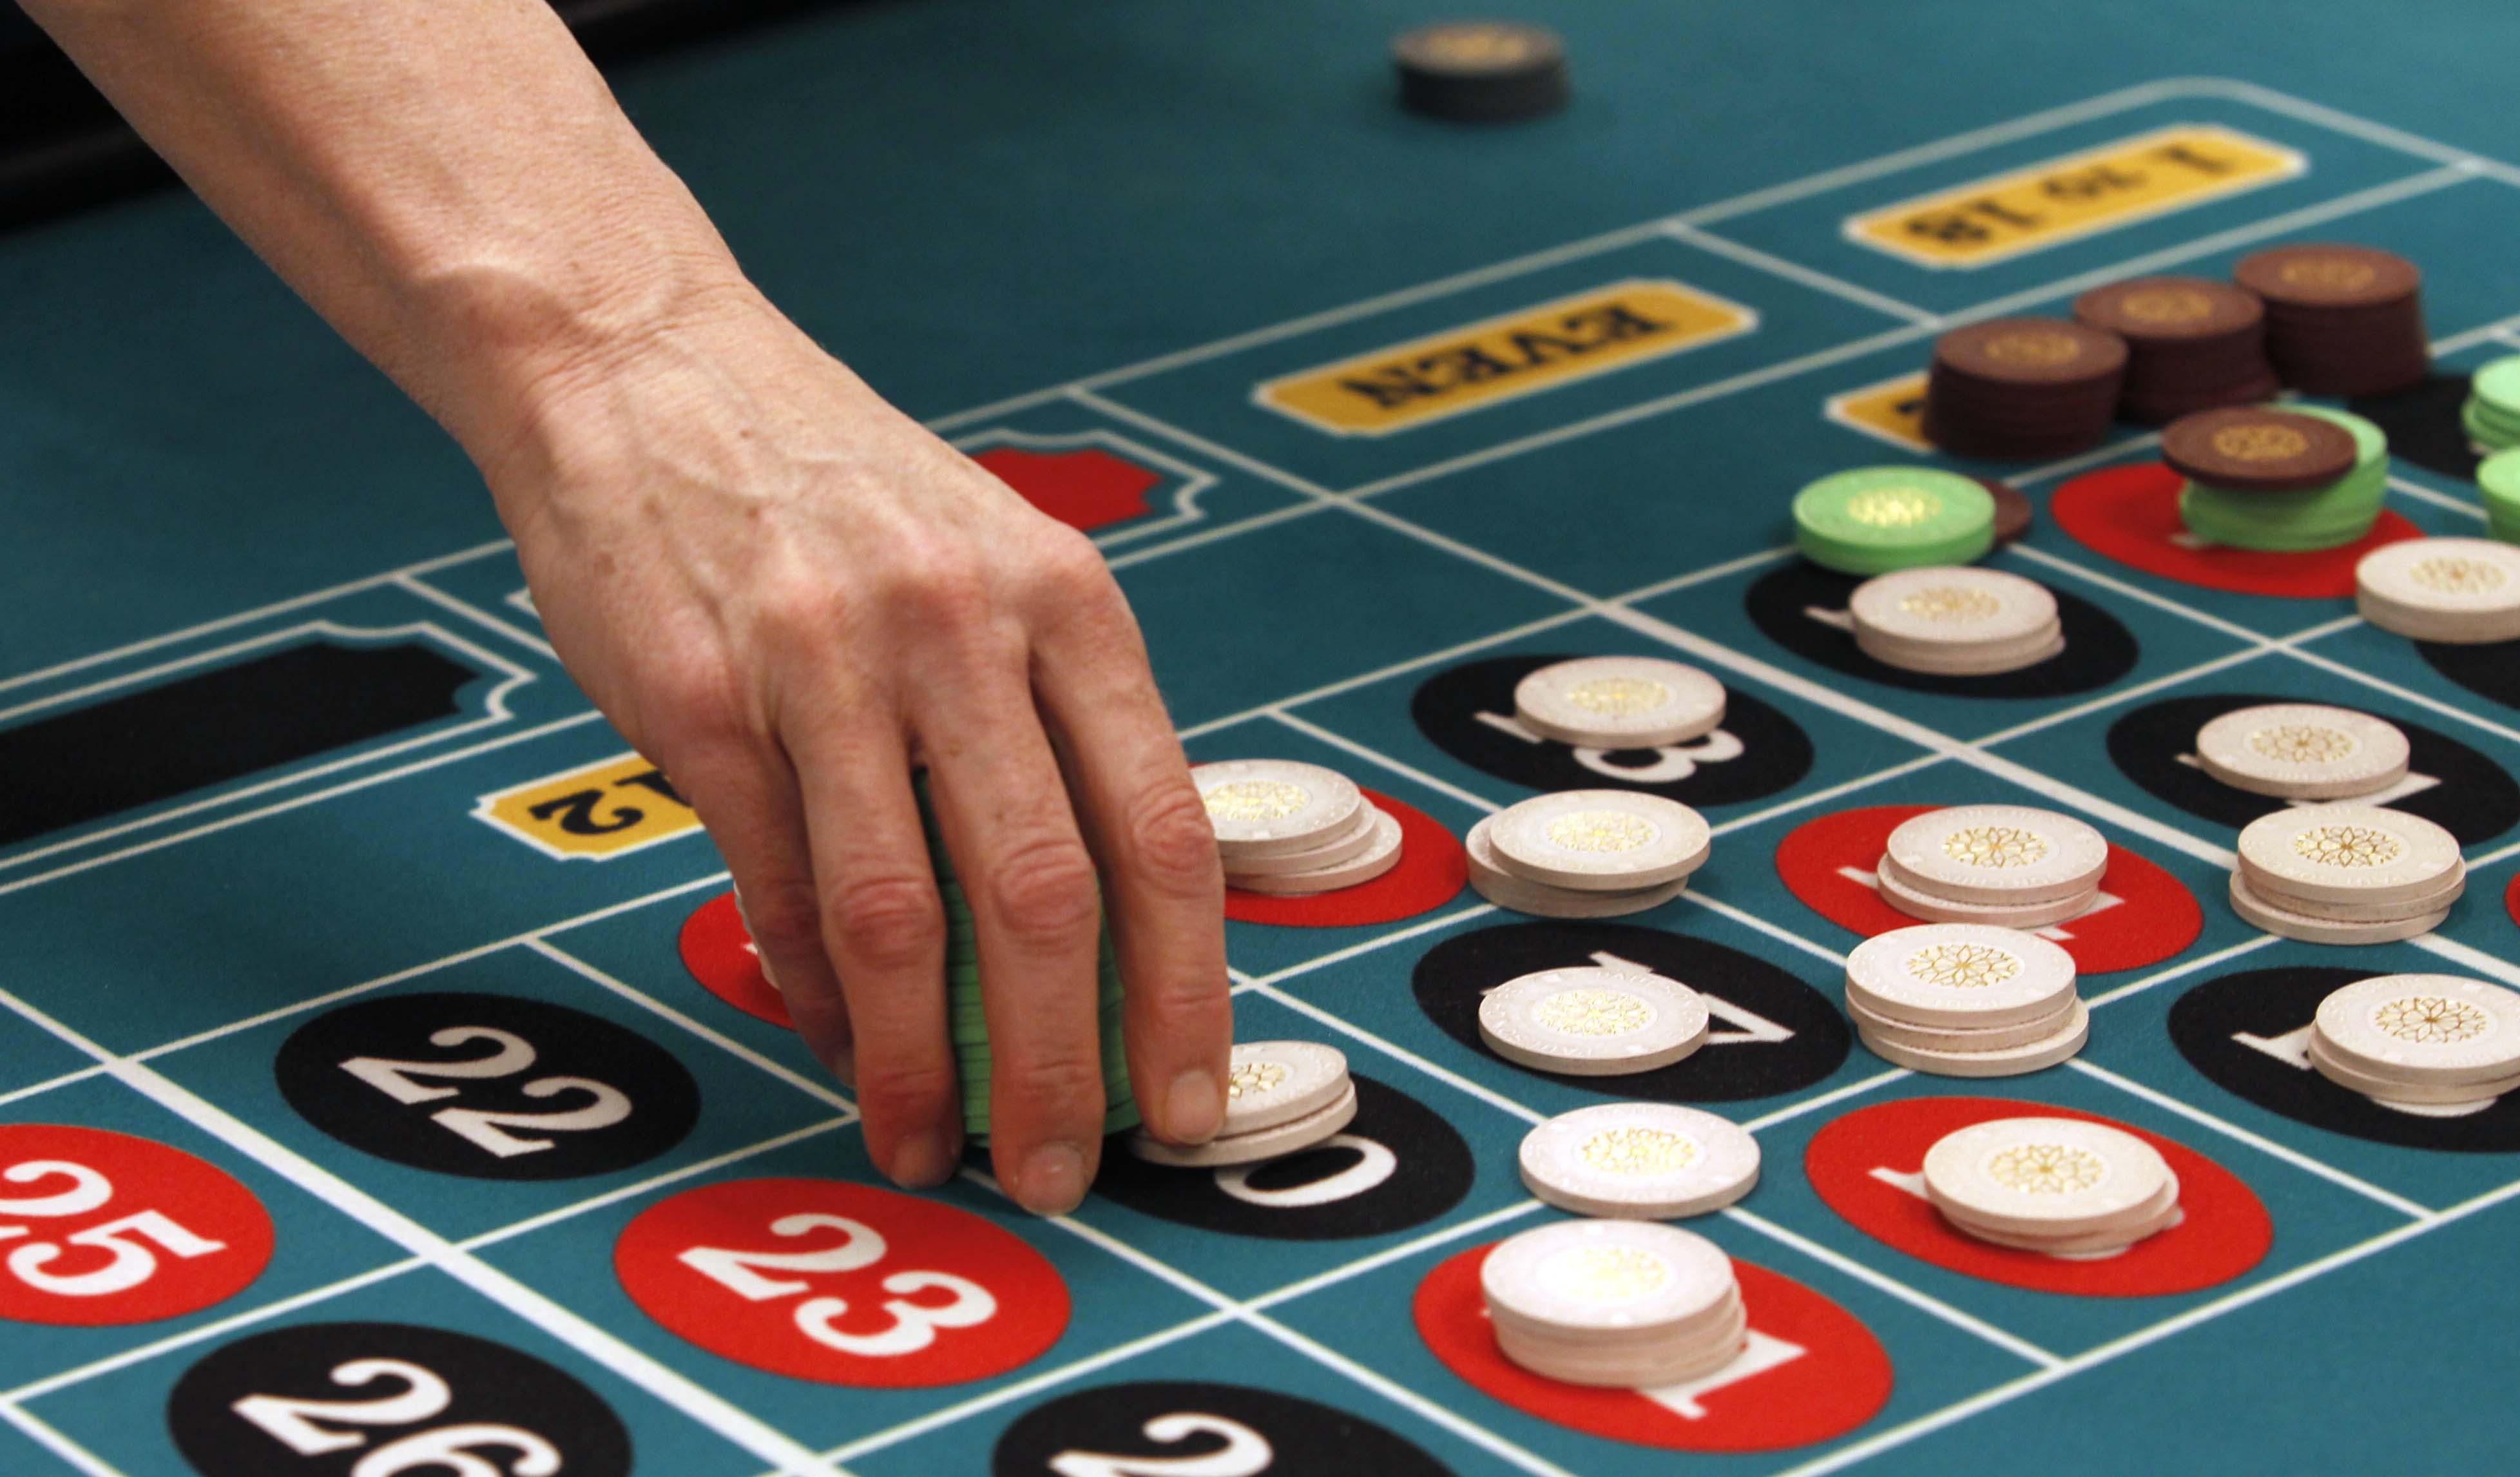 Pleasant Hollywood Casino Toledo Hours Breaking Bad Blackjack Download Free Architecture Designs Itiscsunscenecom